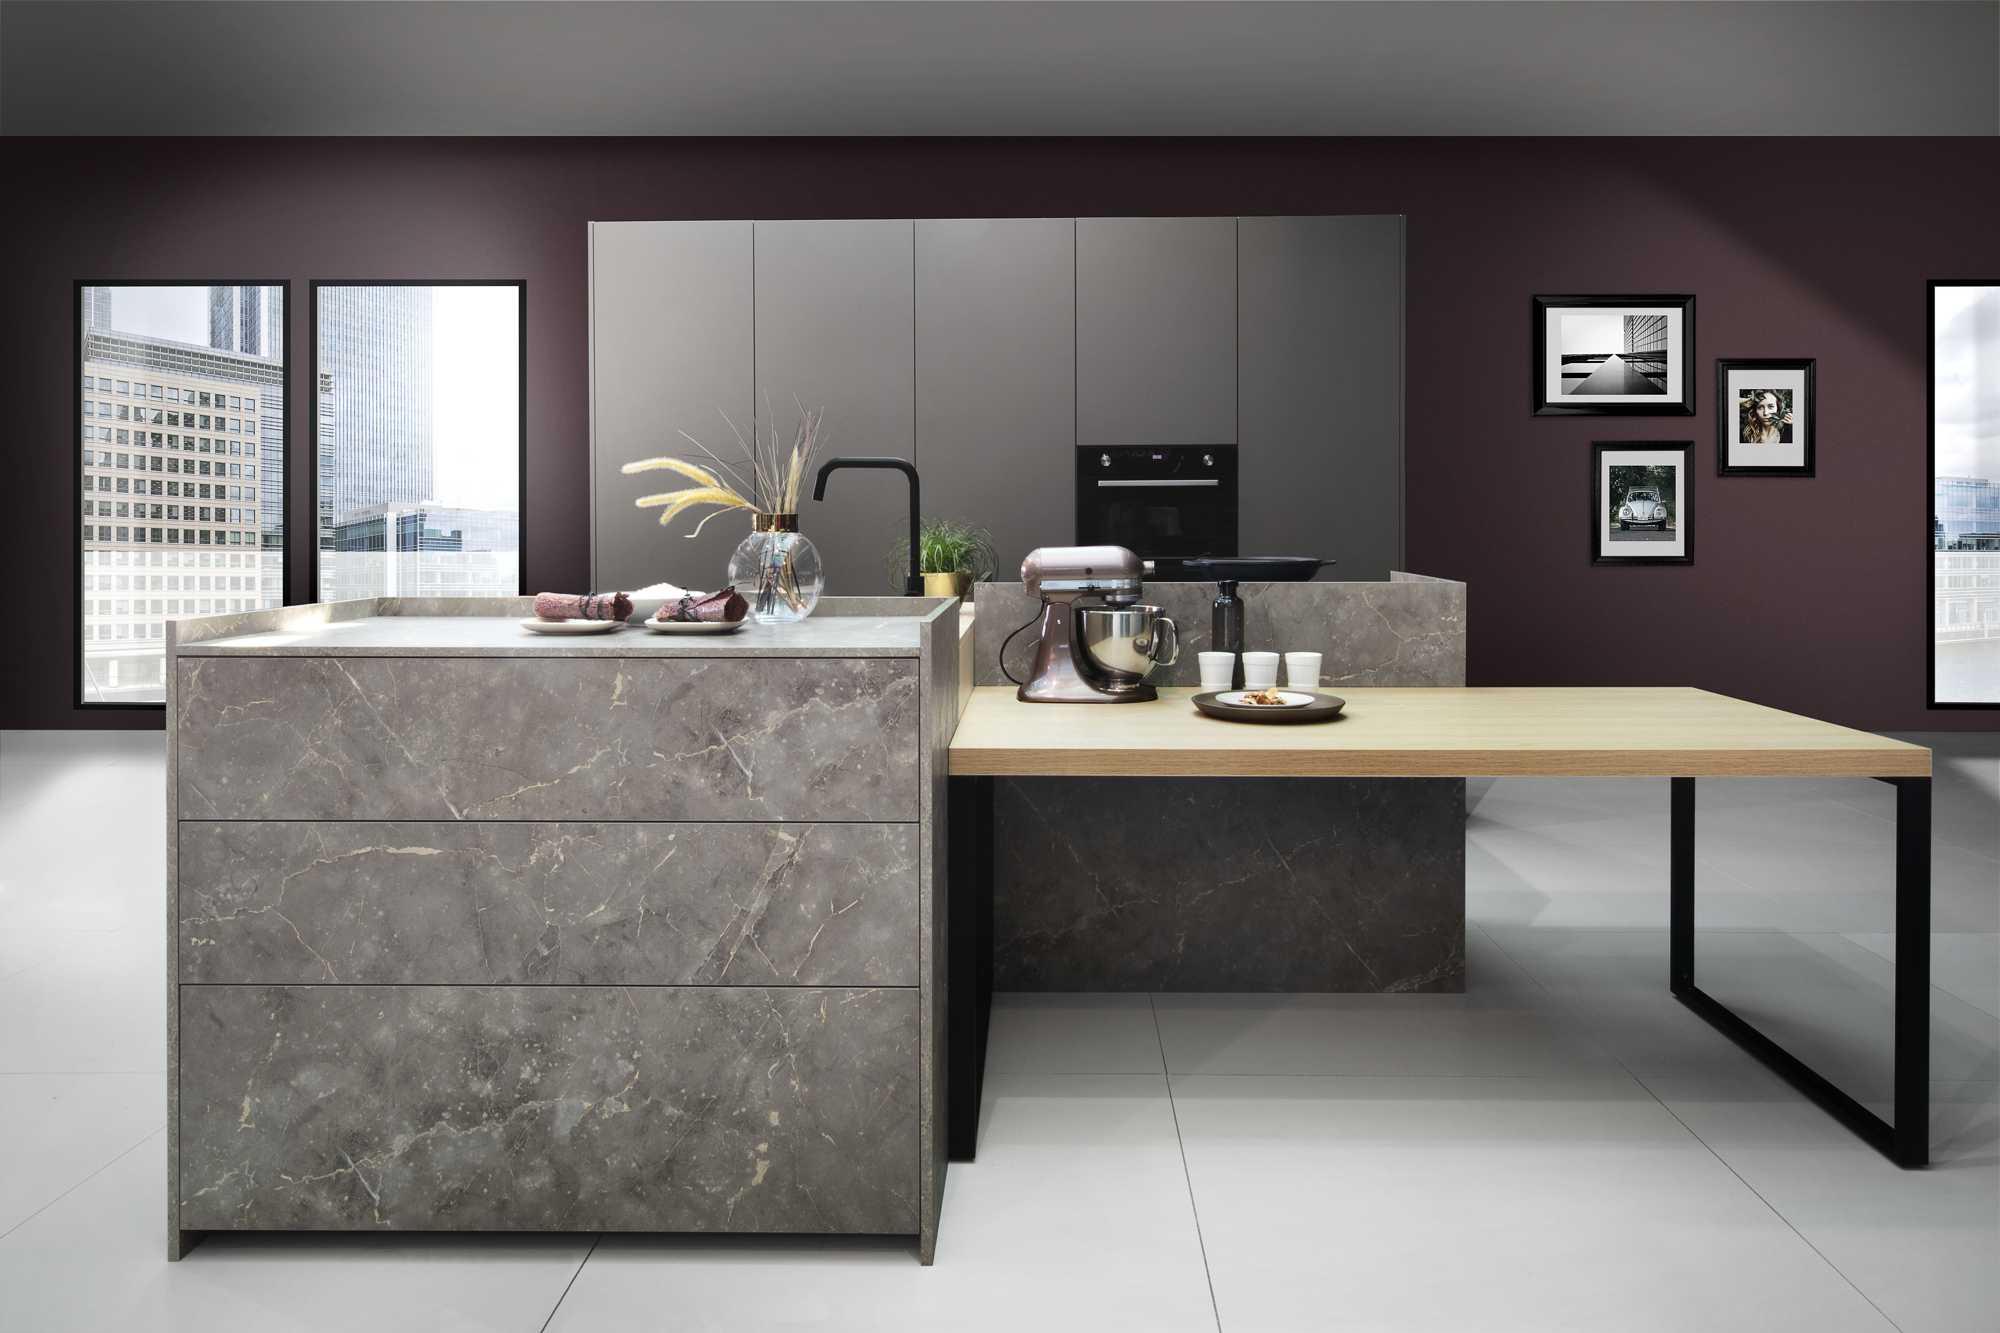 ZeroxFine Matt City Nature Oak, Umbra Marble KQ And Power Umba LX Kitchen With Extra Tall Larder units